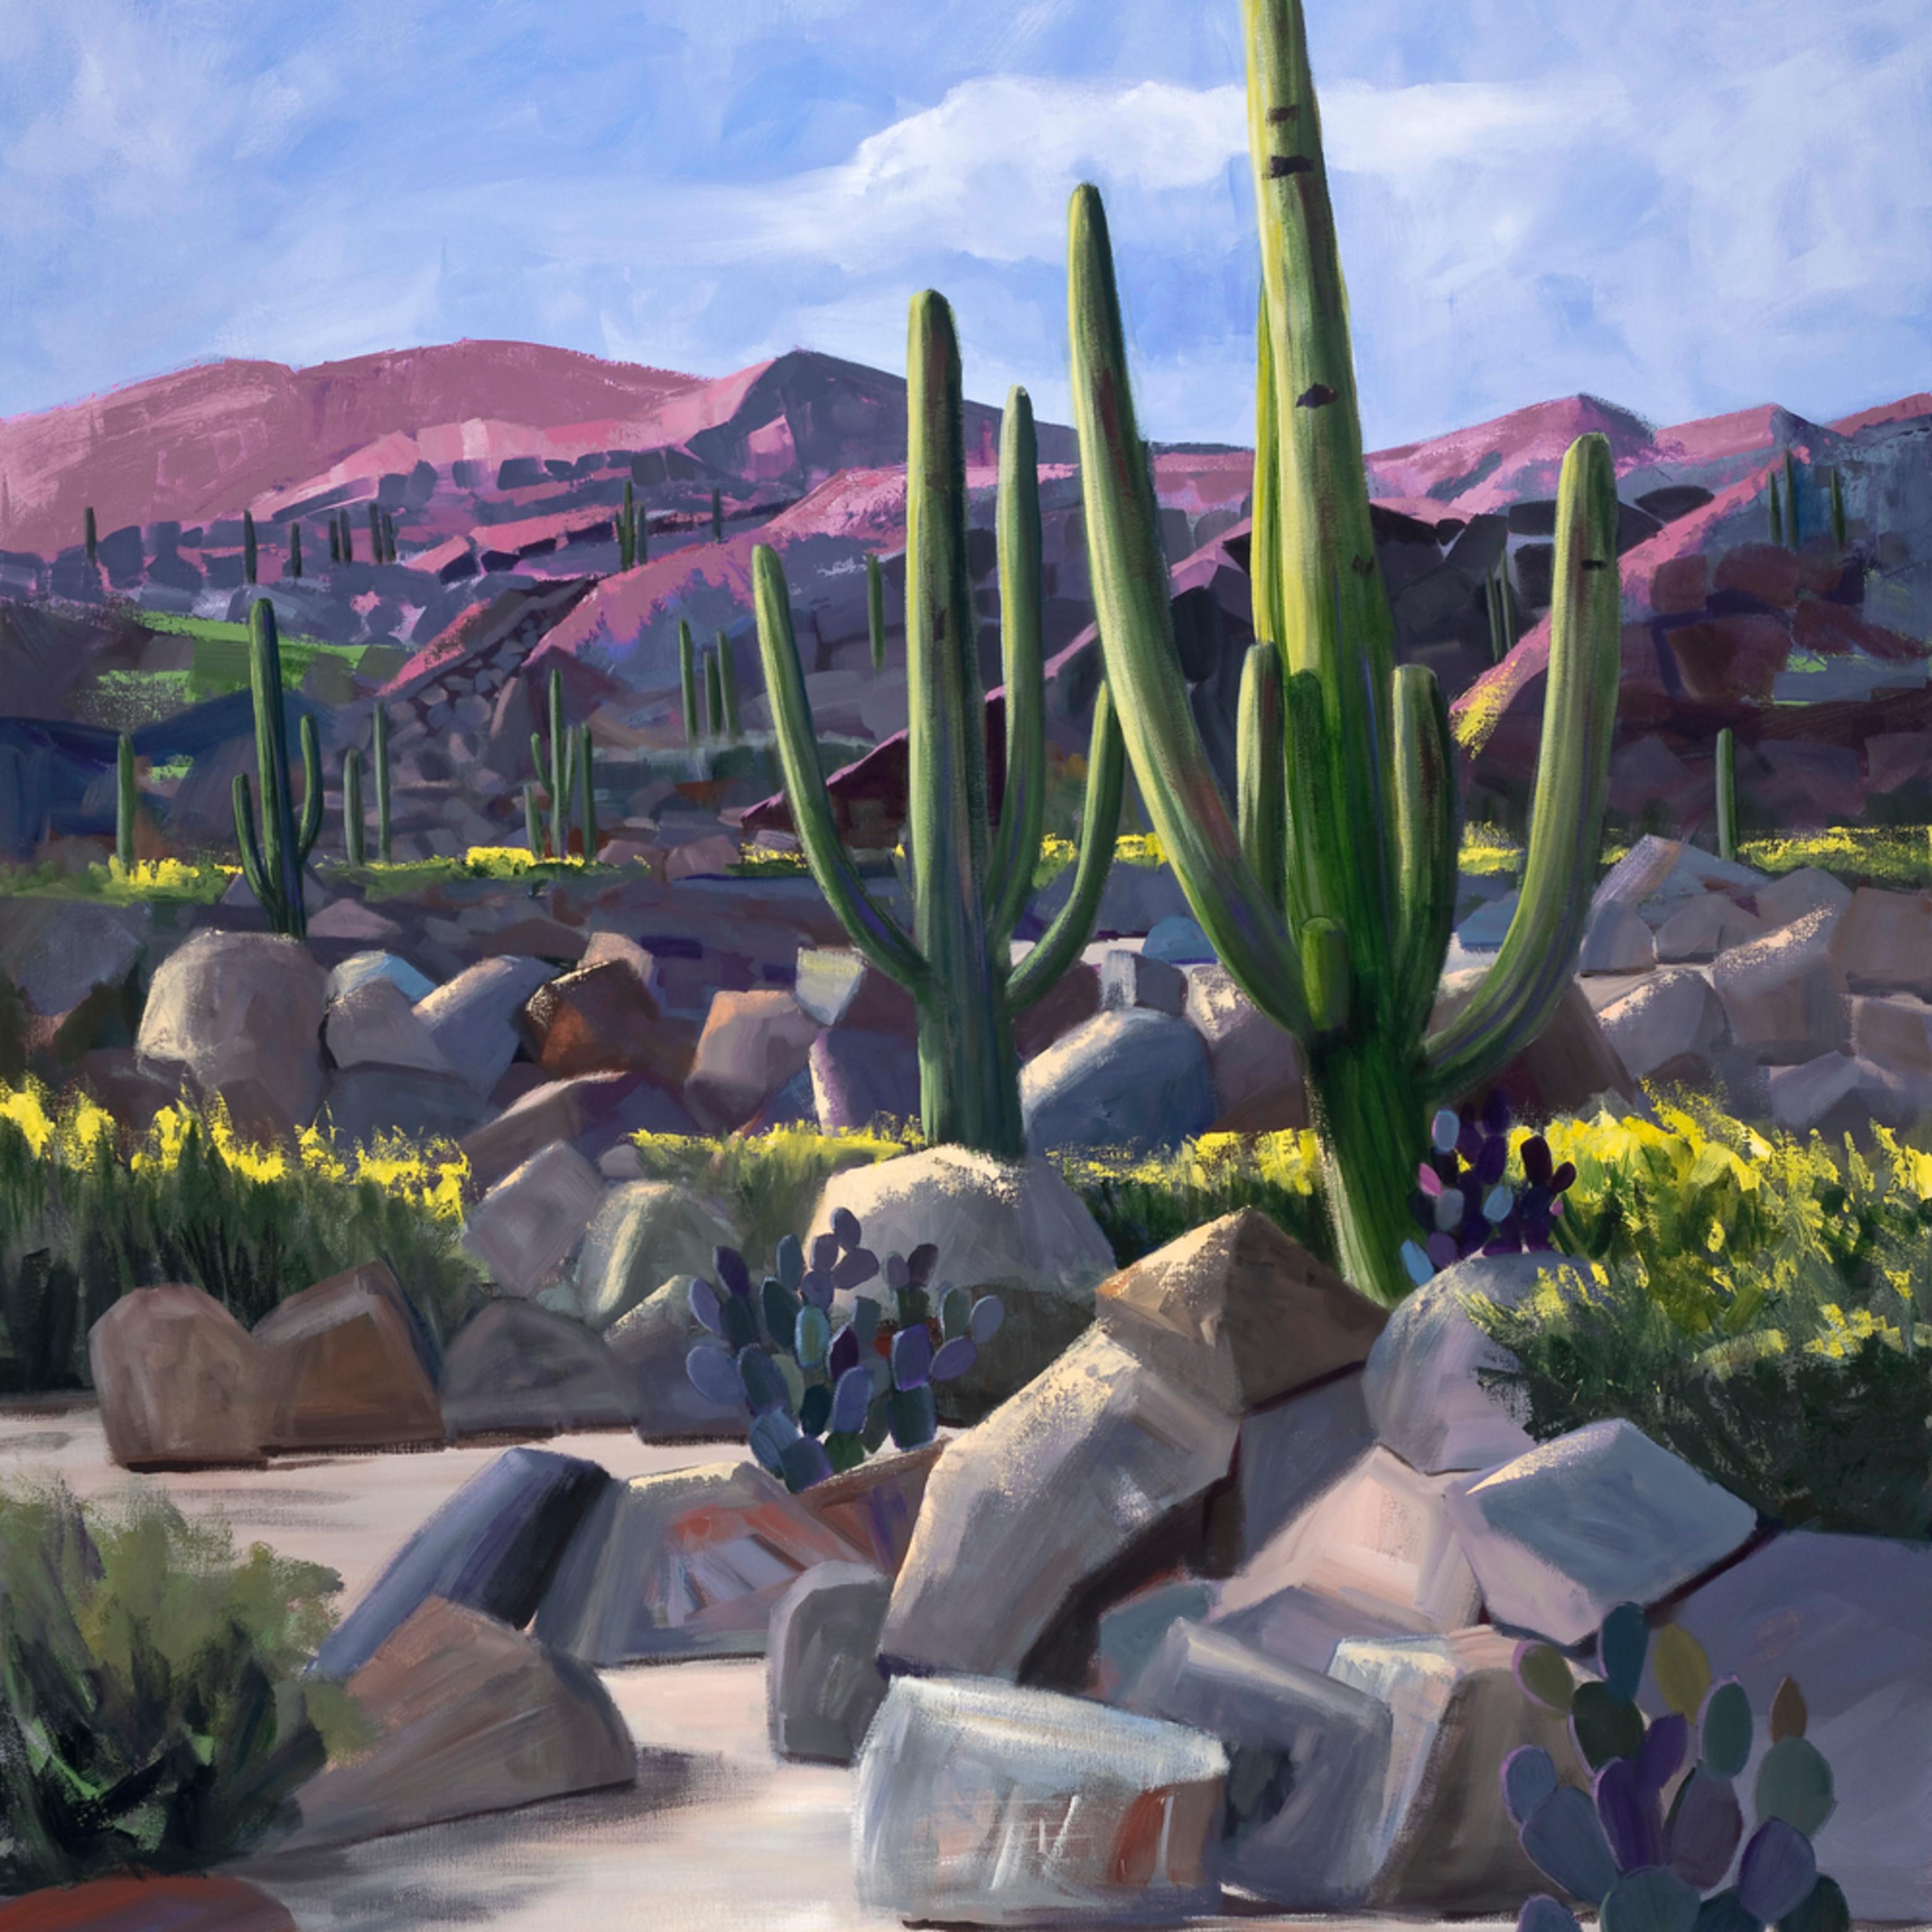 Party cactus i by diana madaras 60 x 48 edited sky kqaknz